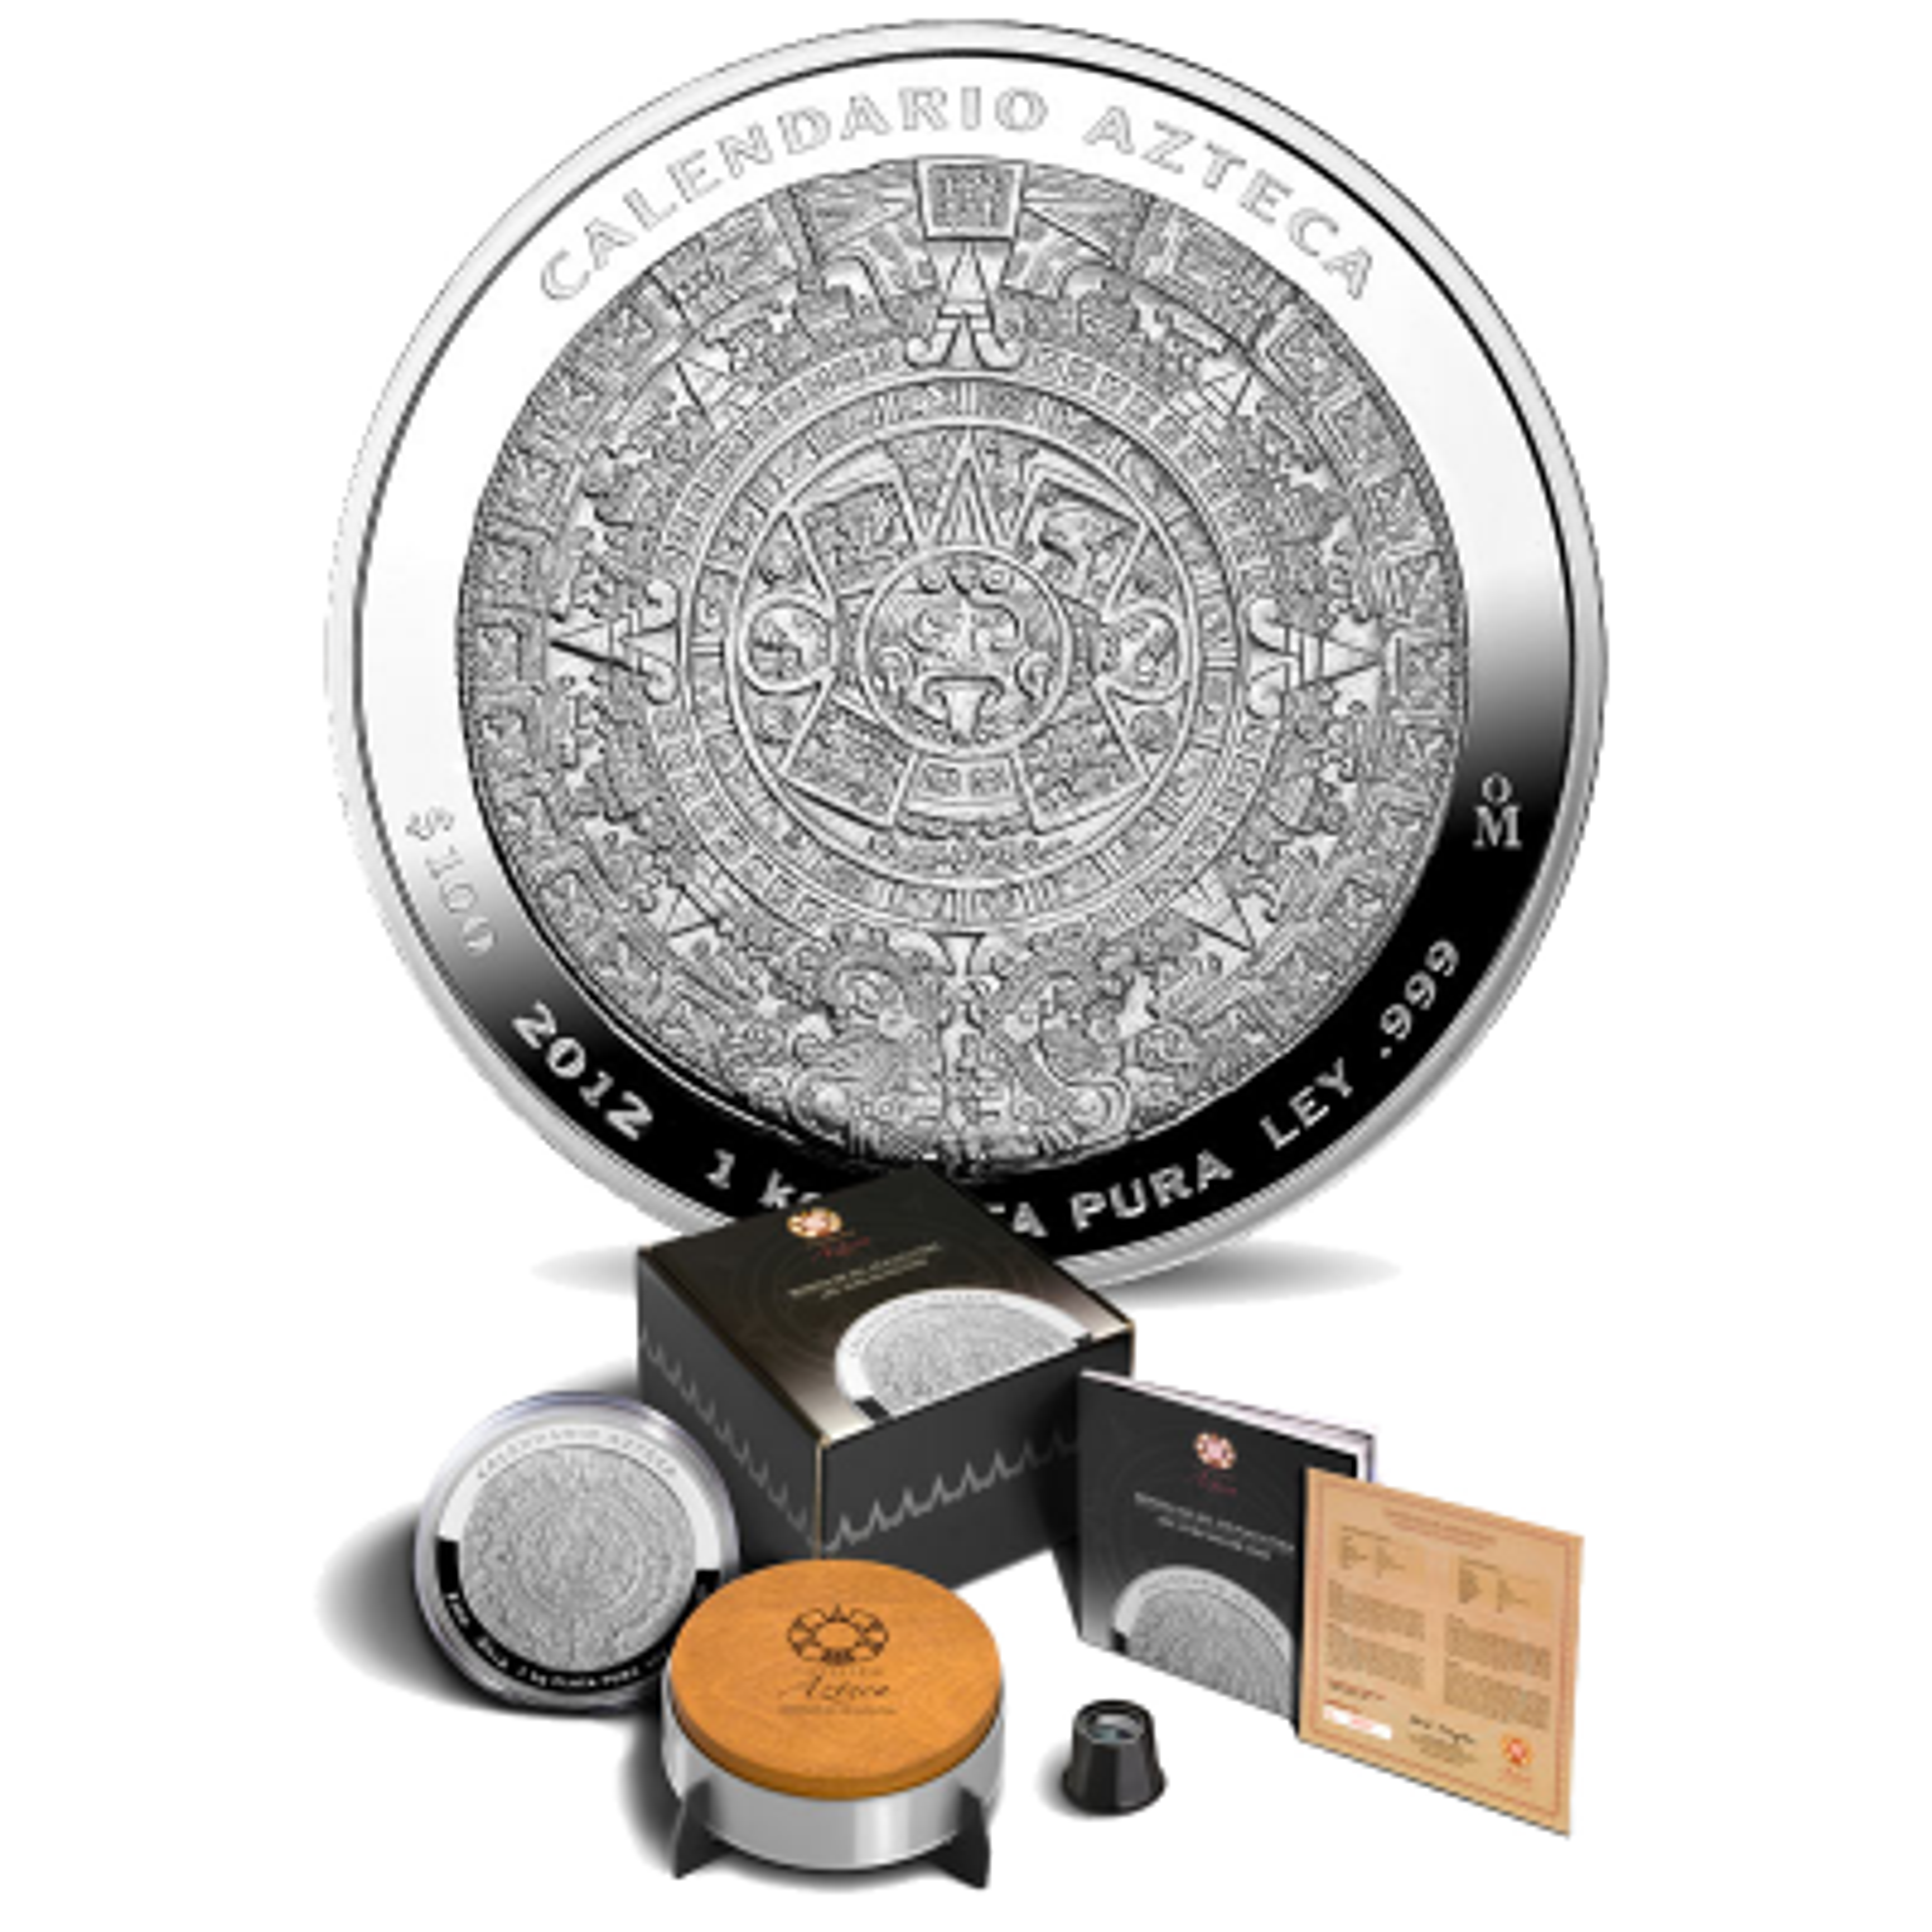 Azteekse kalender kilo zilver munt 2015